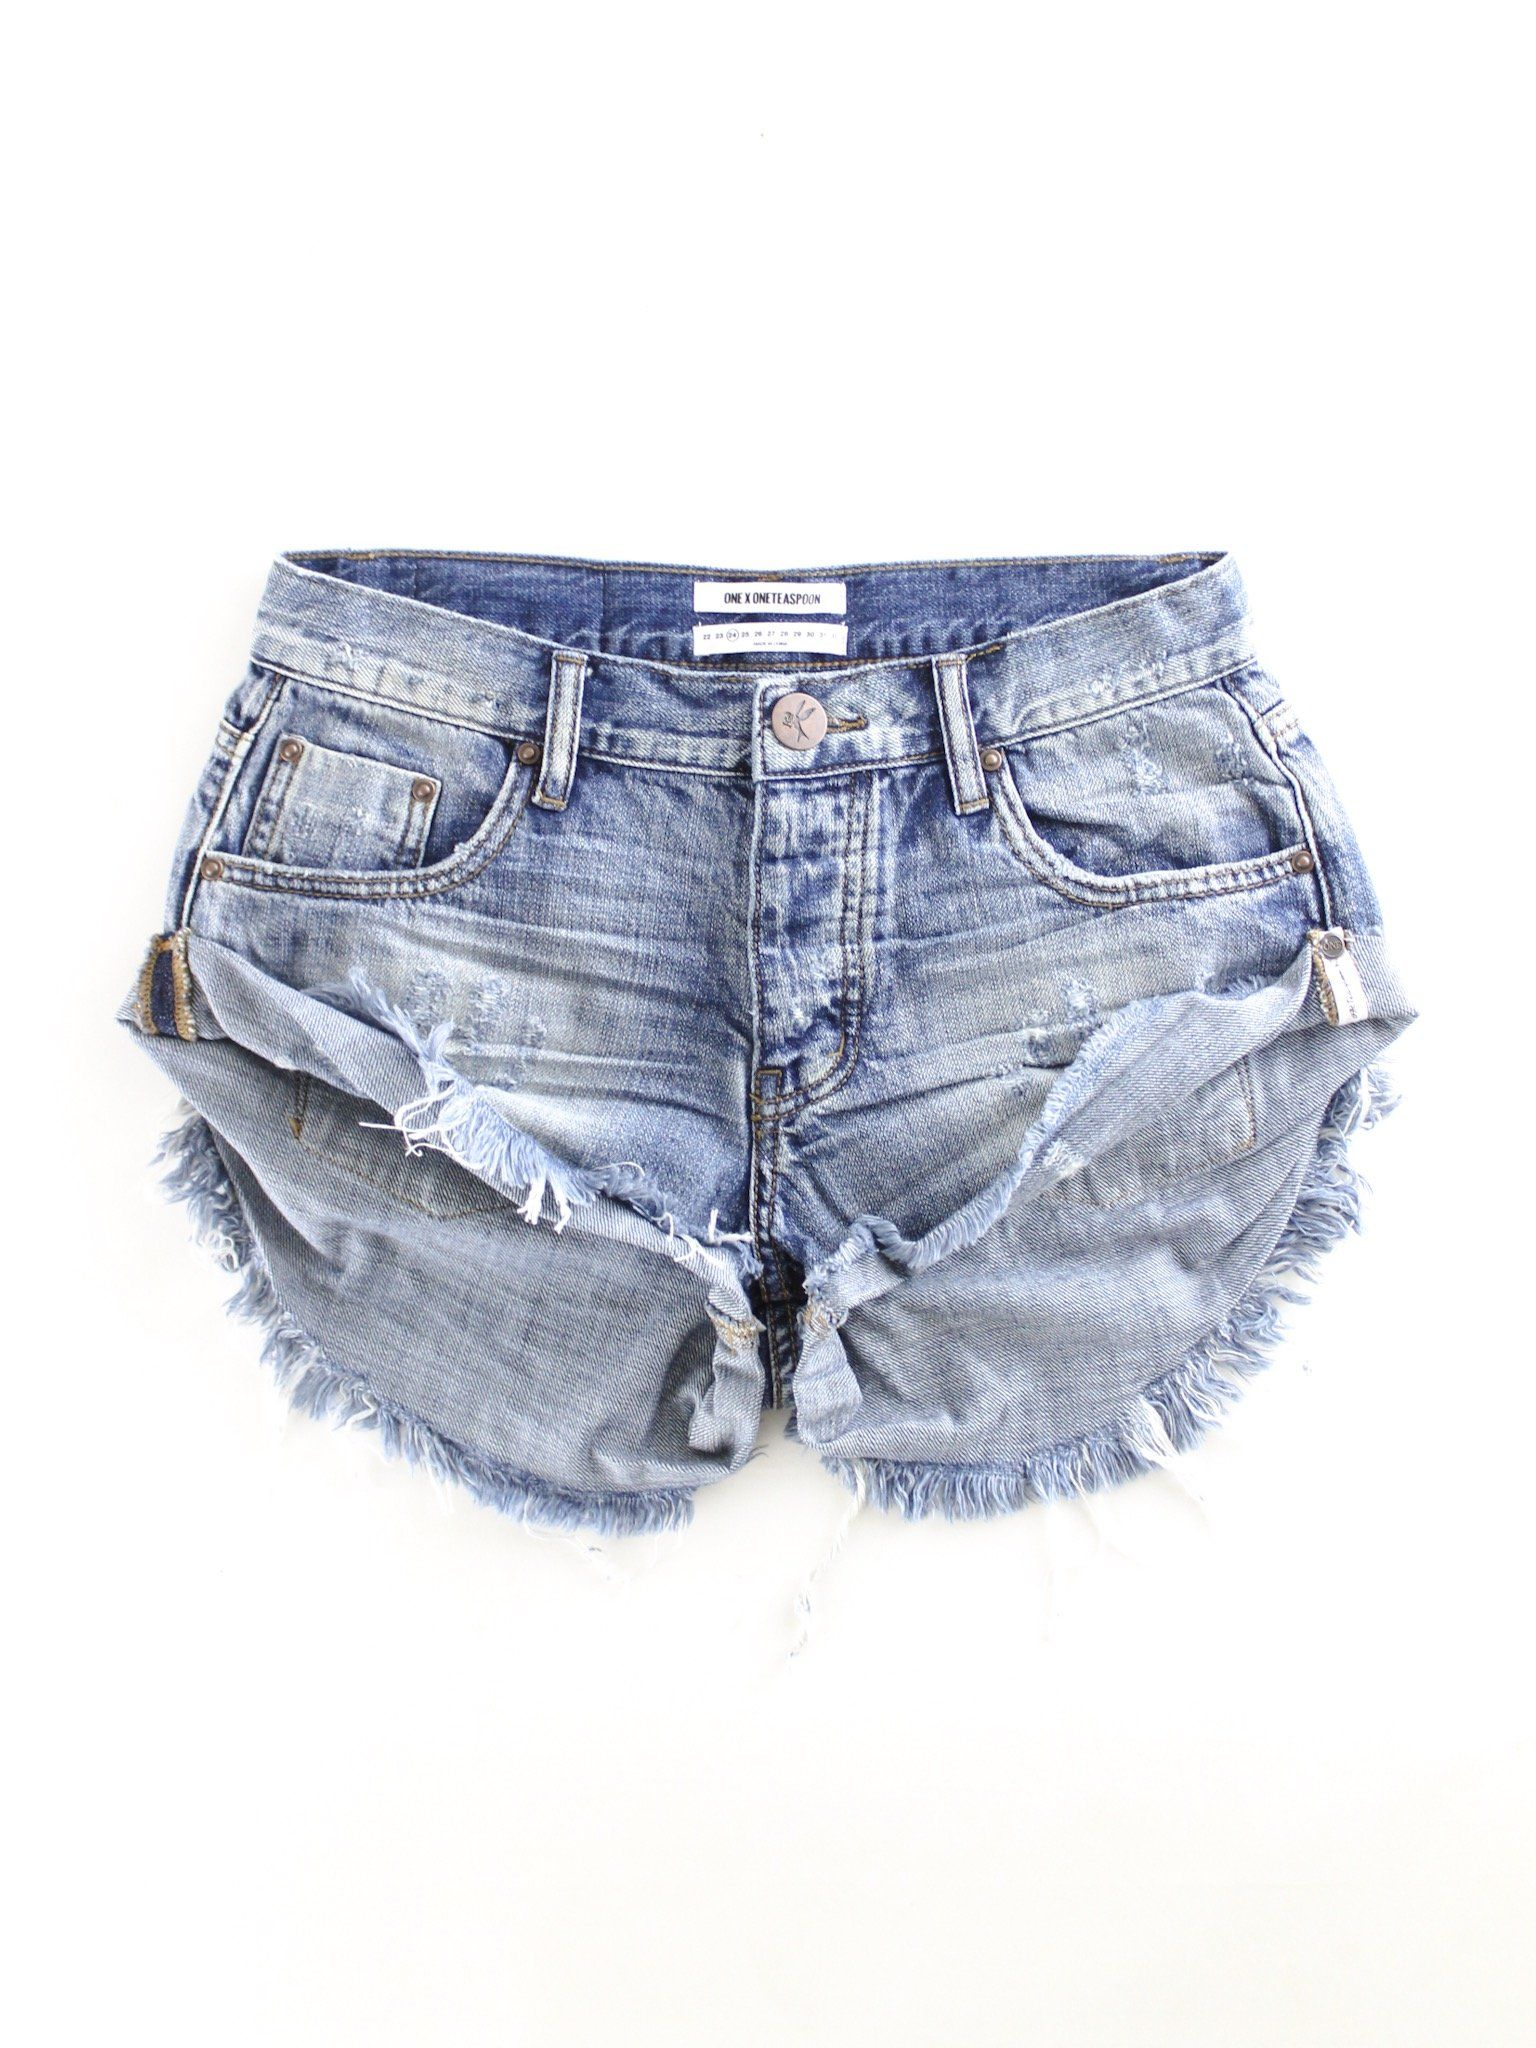 One Teaspoon Bandits Denim Shorts Denim Blue Jean Shorts Outfit